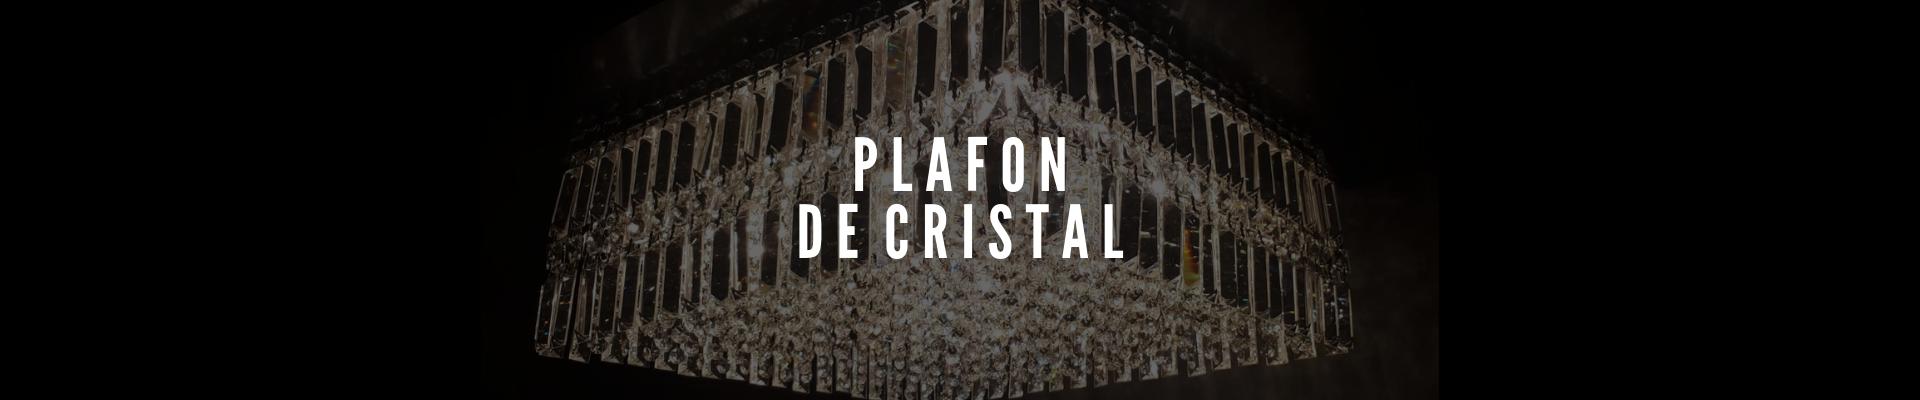 Plafons de Cristal